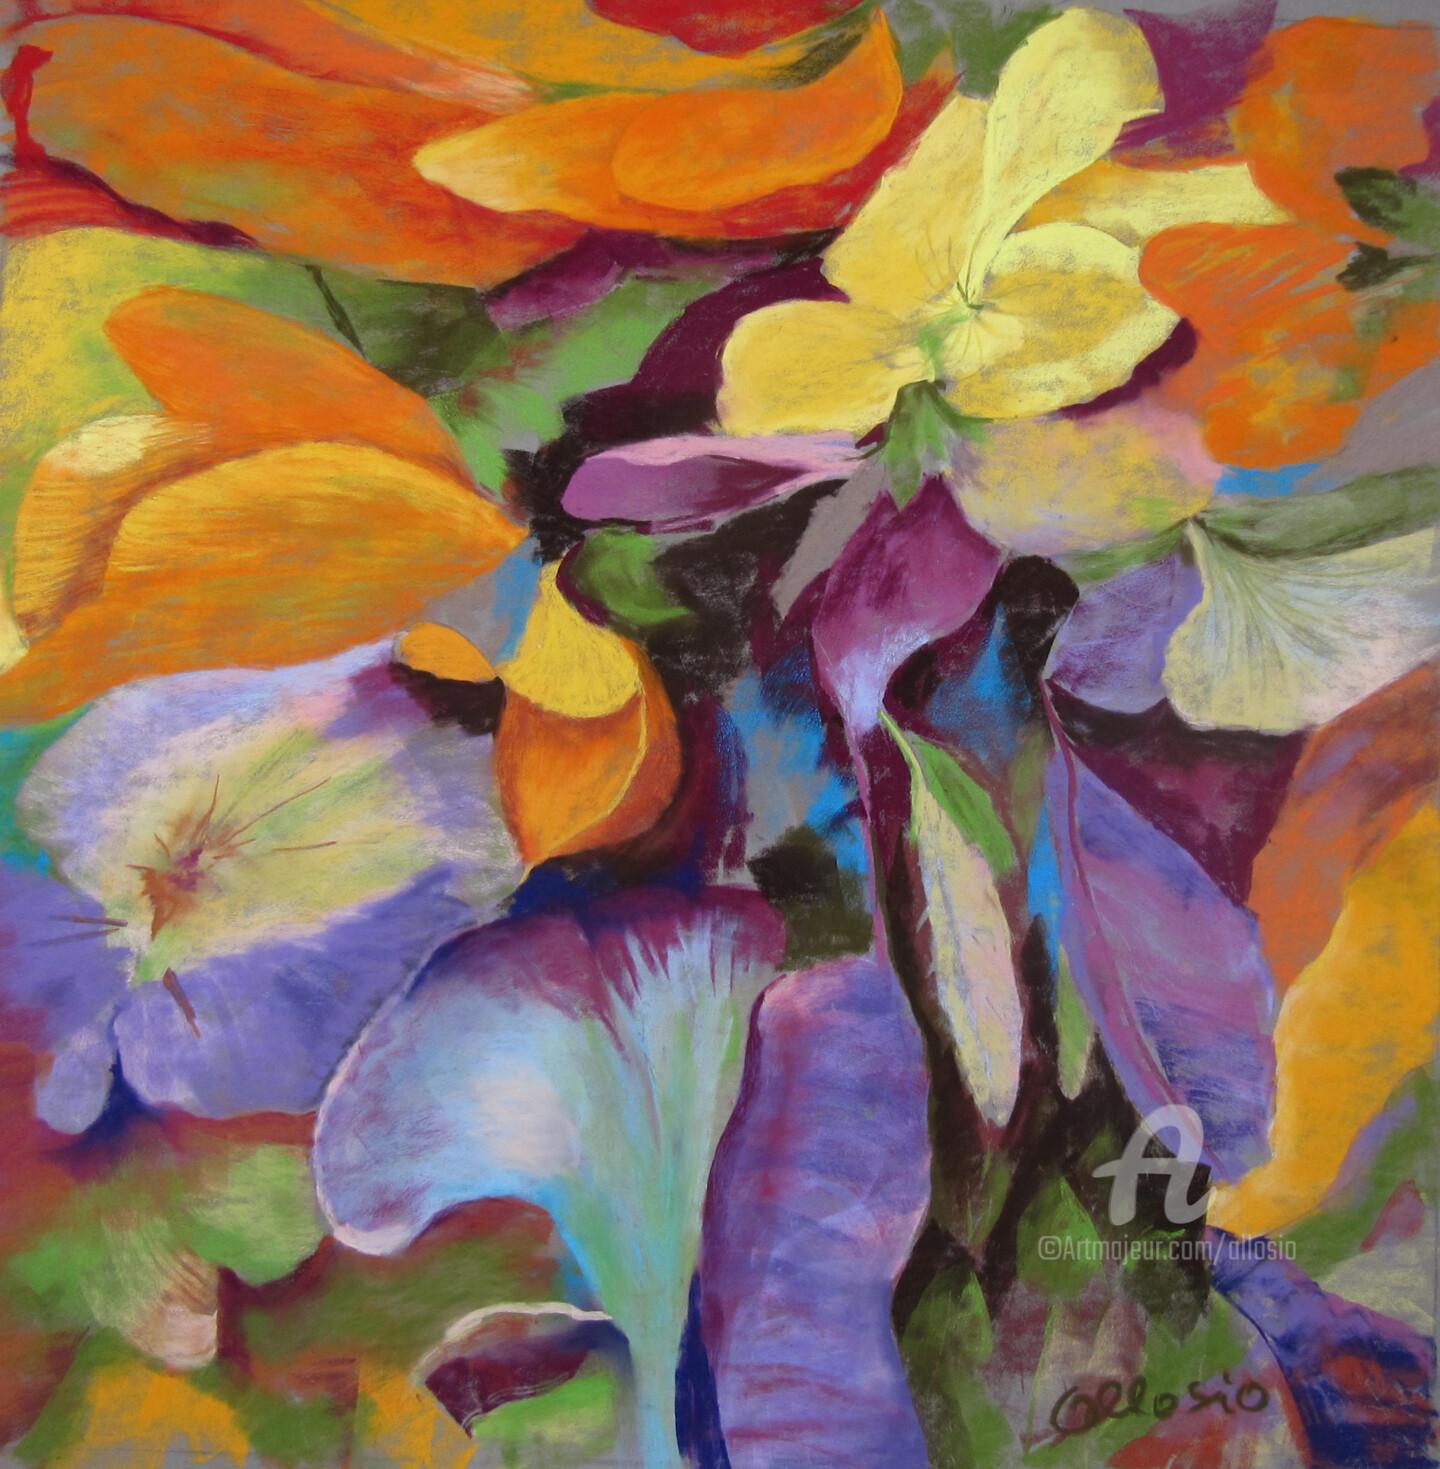 Claudette Allosio - decomposition-florale.jpg